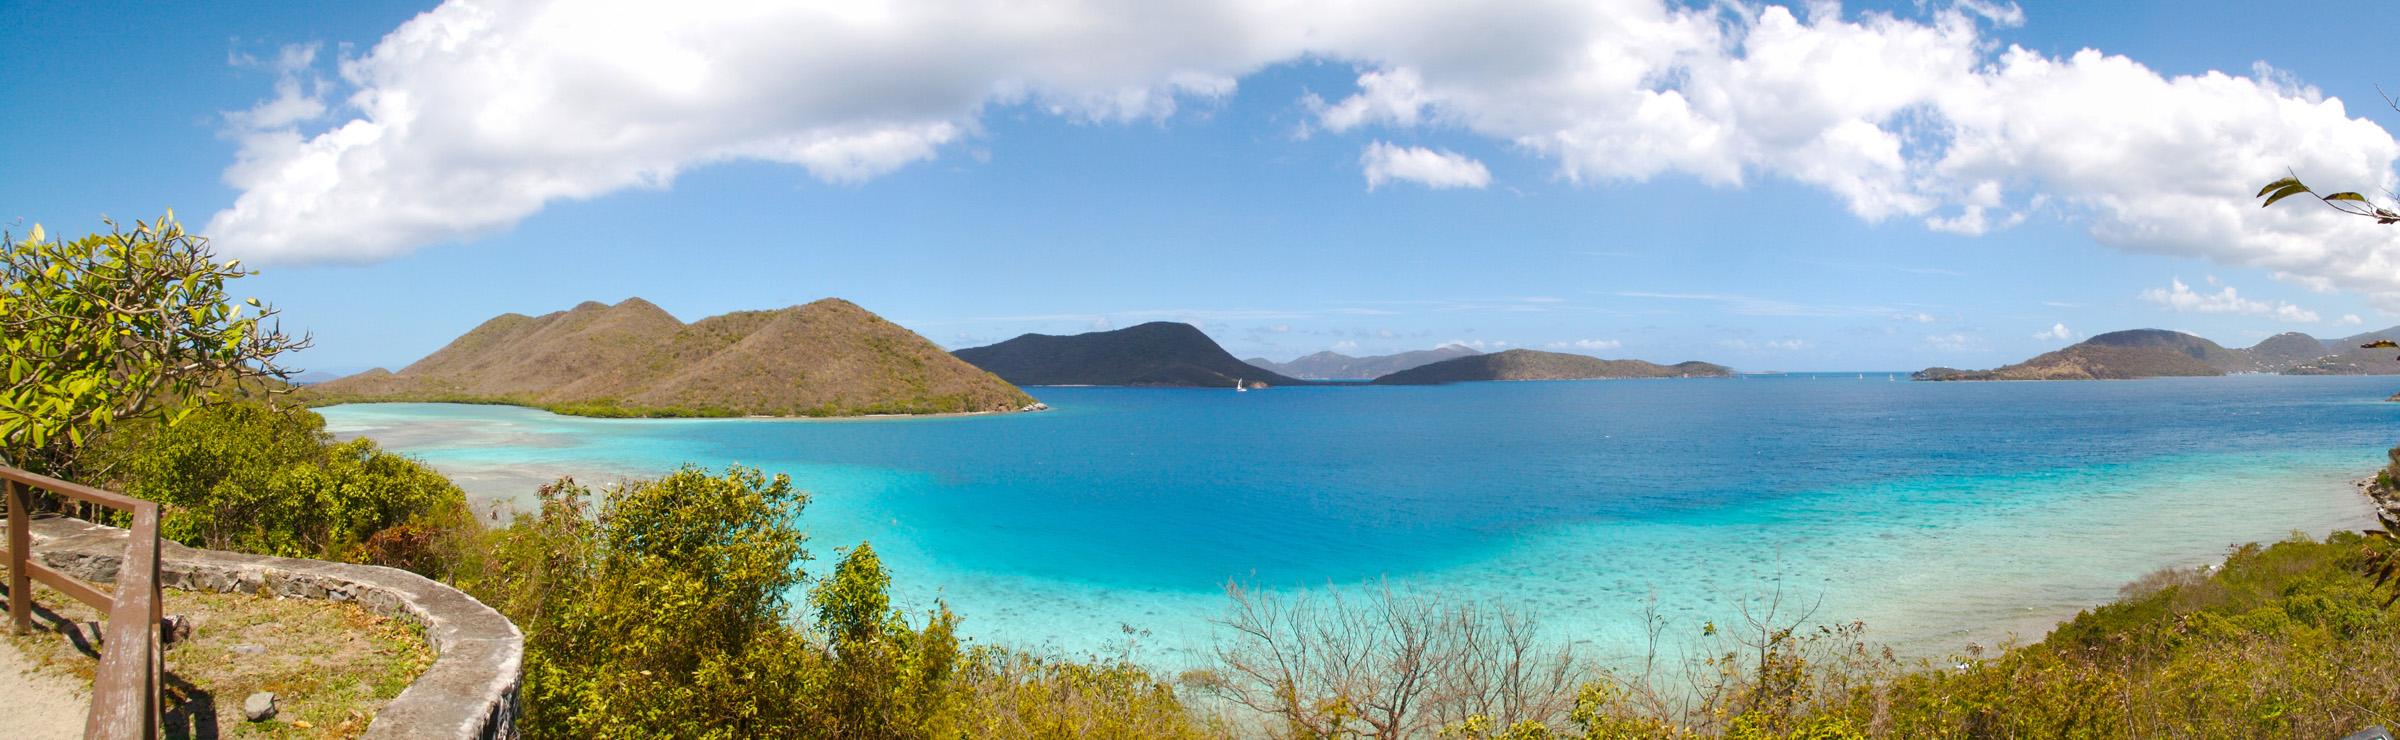 Leinster Bay, US Virgin Islands - by Alan Wolf